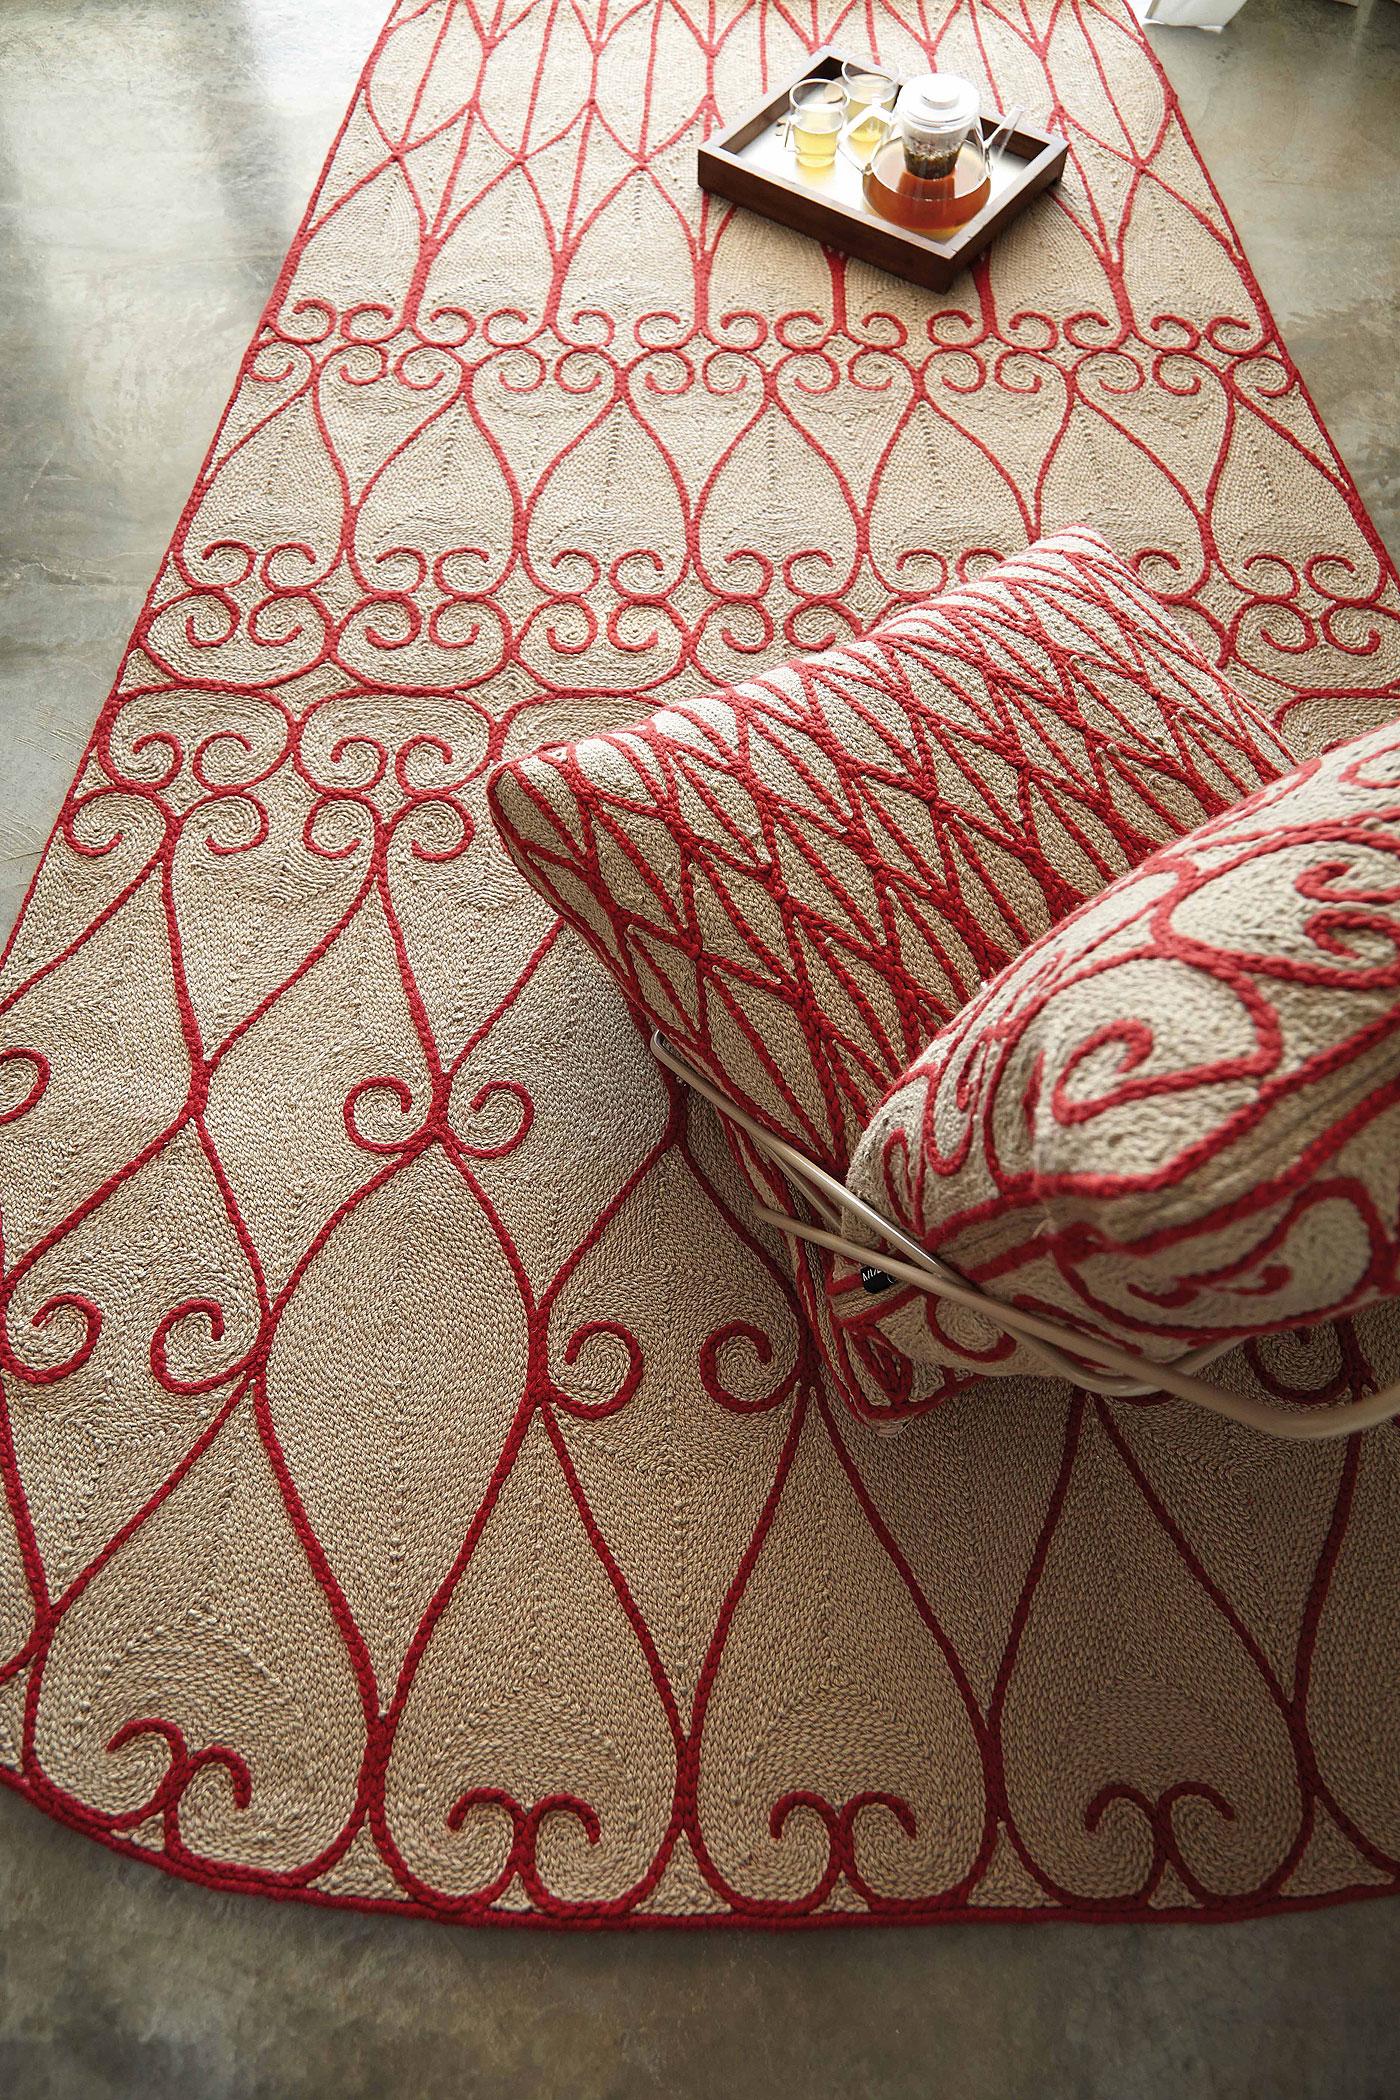 alfombra-valentina-alejandra-gandia-blasco (2)